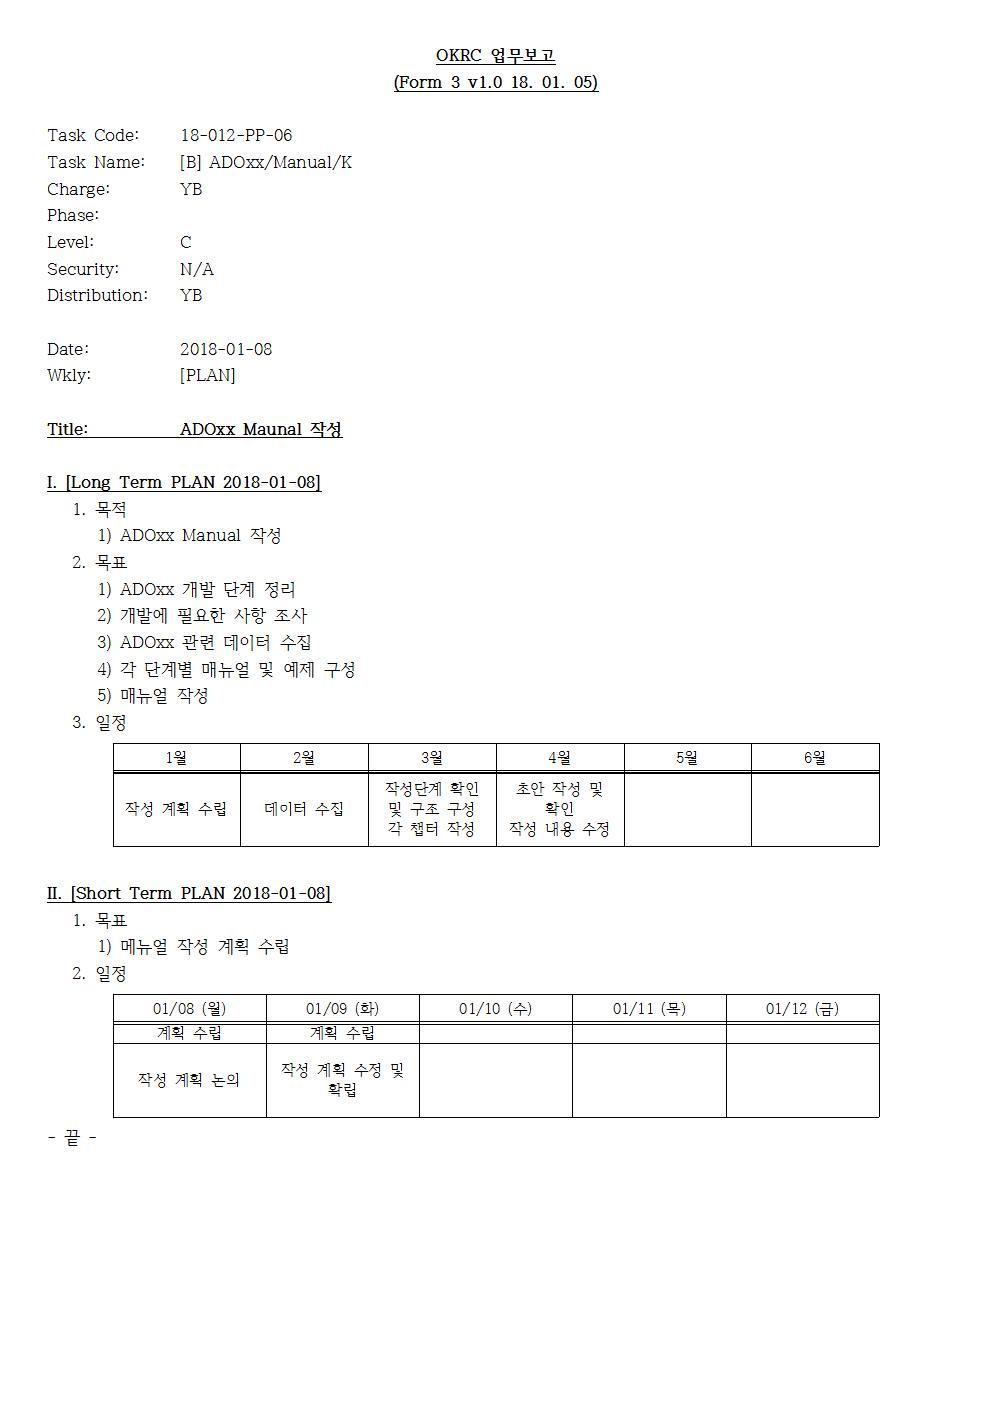 D-[18-012-PP-06]-[ADOxx Maunal K]-[2018-01-08][YB]001.jpg